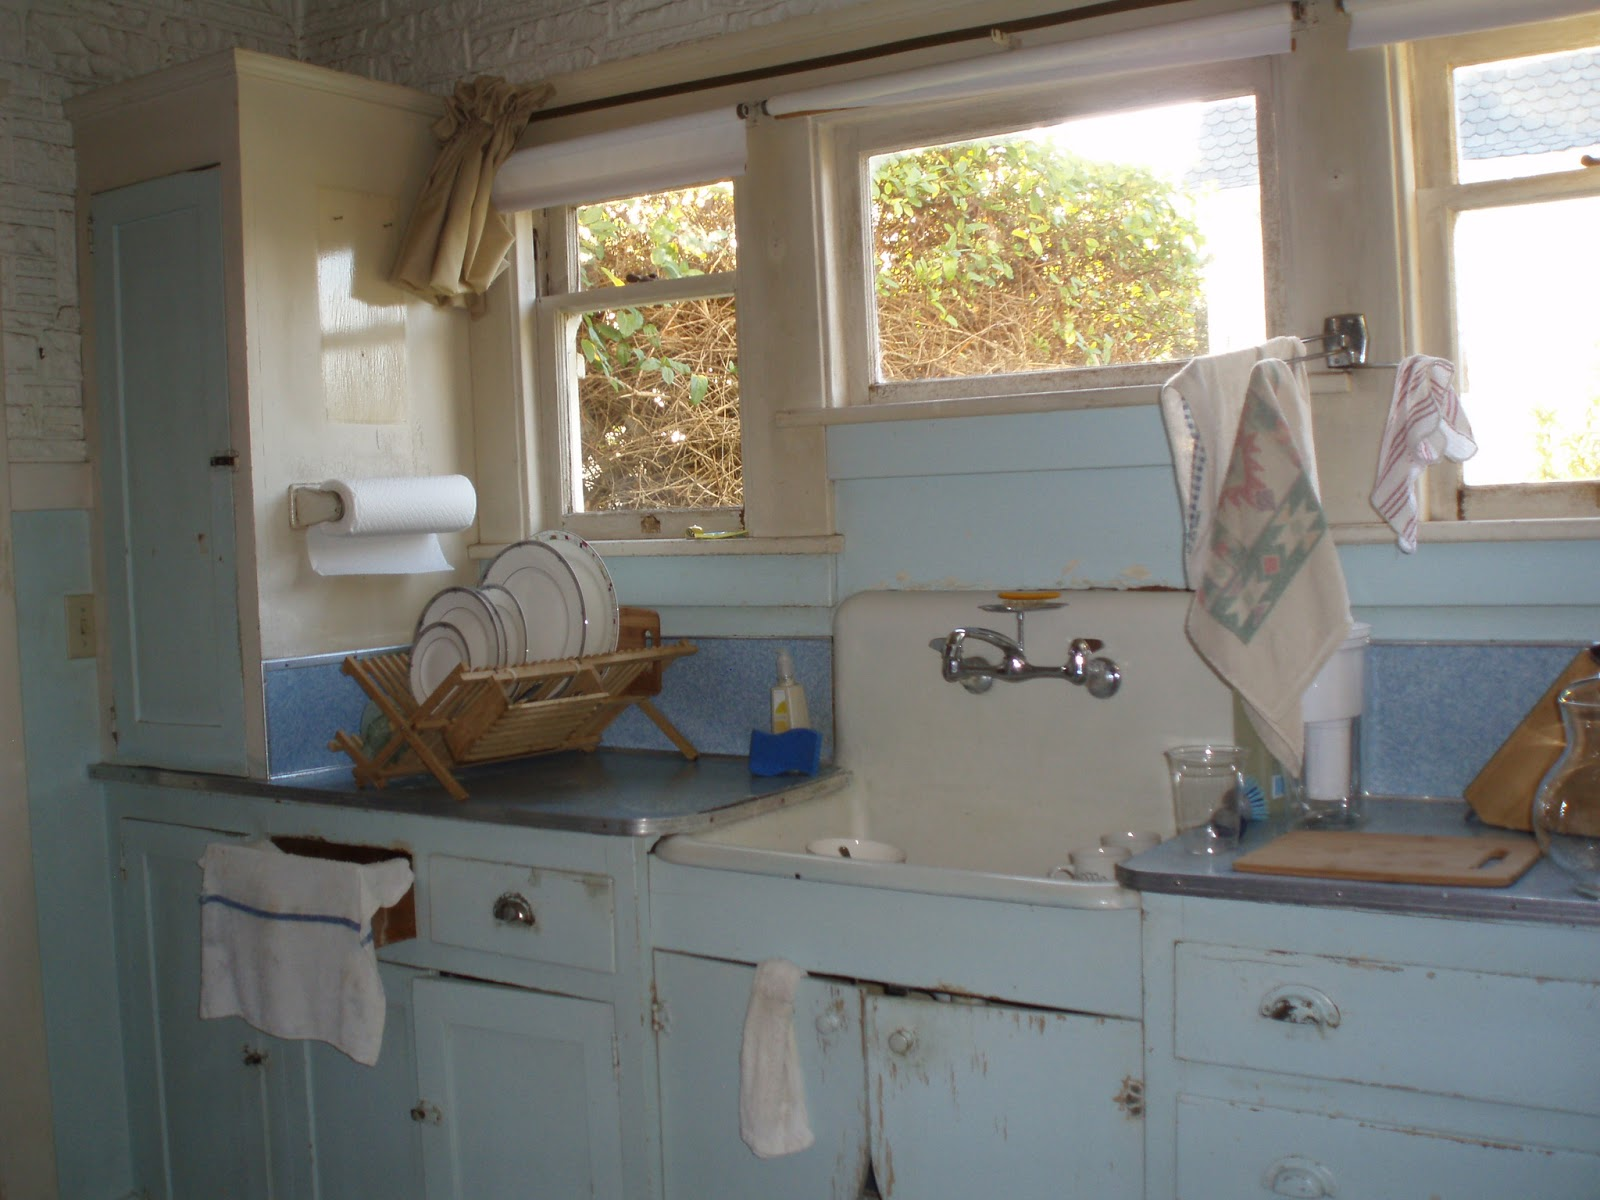 Kitchen and Mudroom - Midori Haus